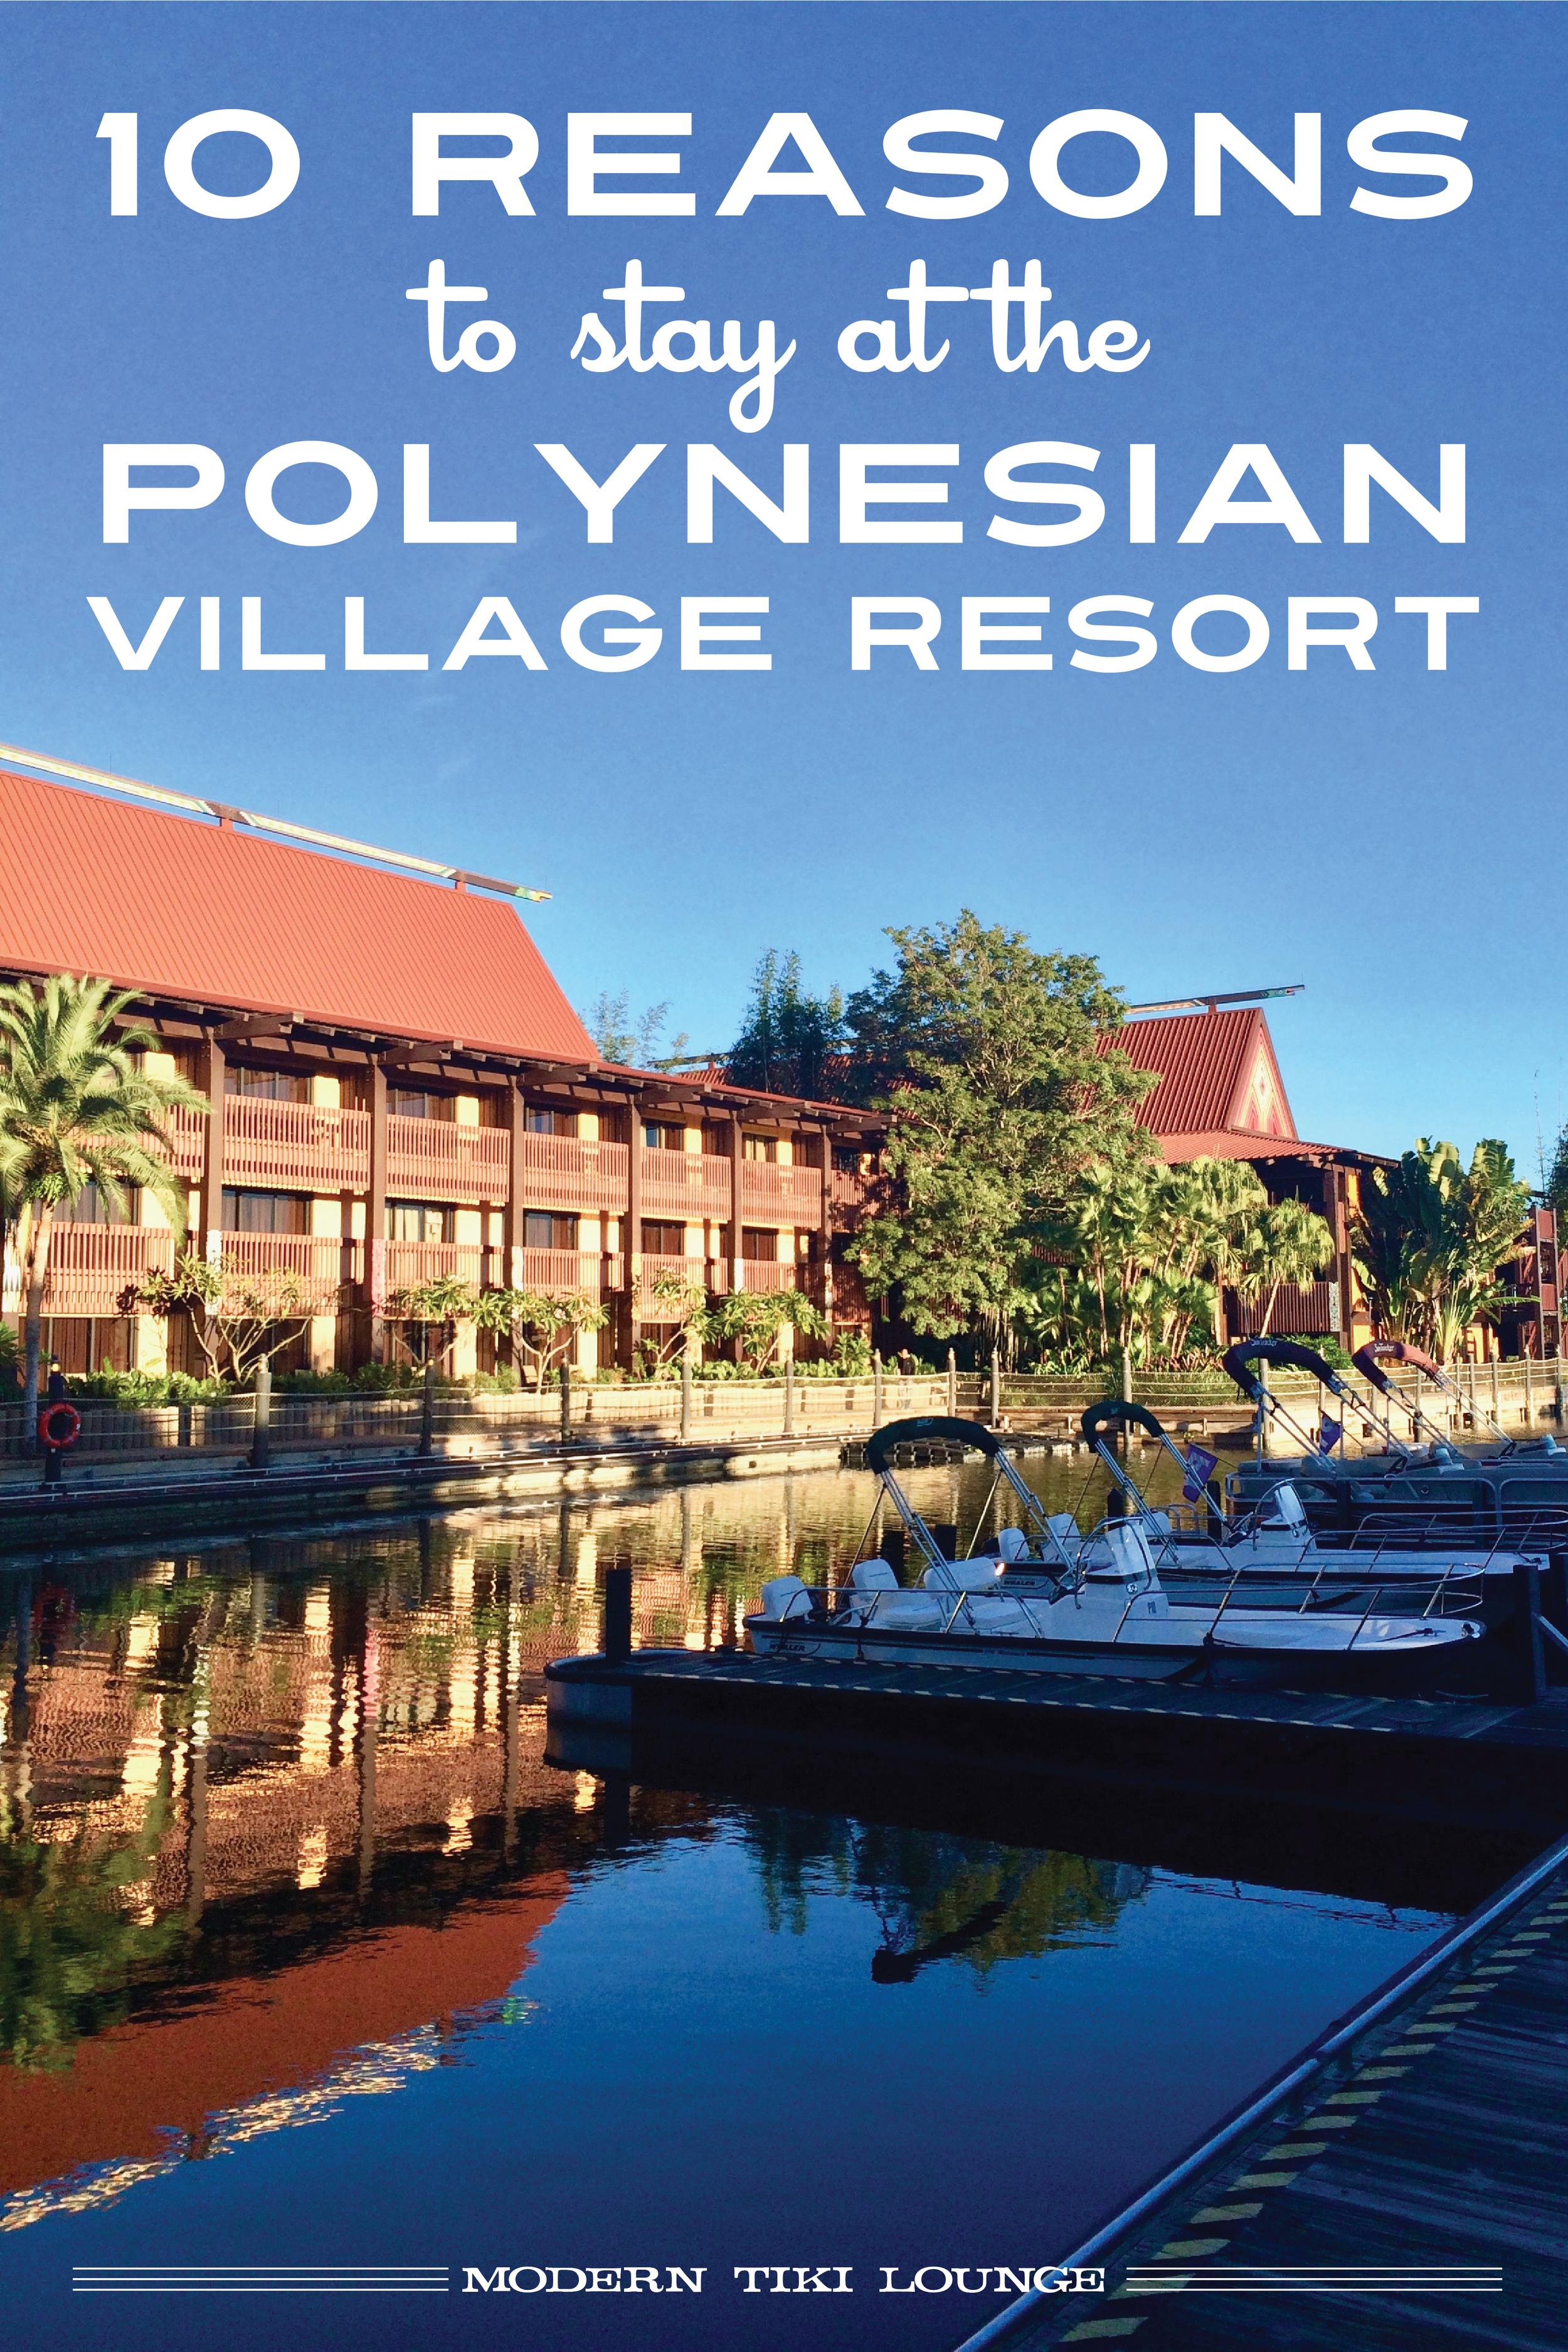 10-reasons-to-stay-at-the-polynesian-village-resort.jpg